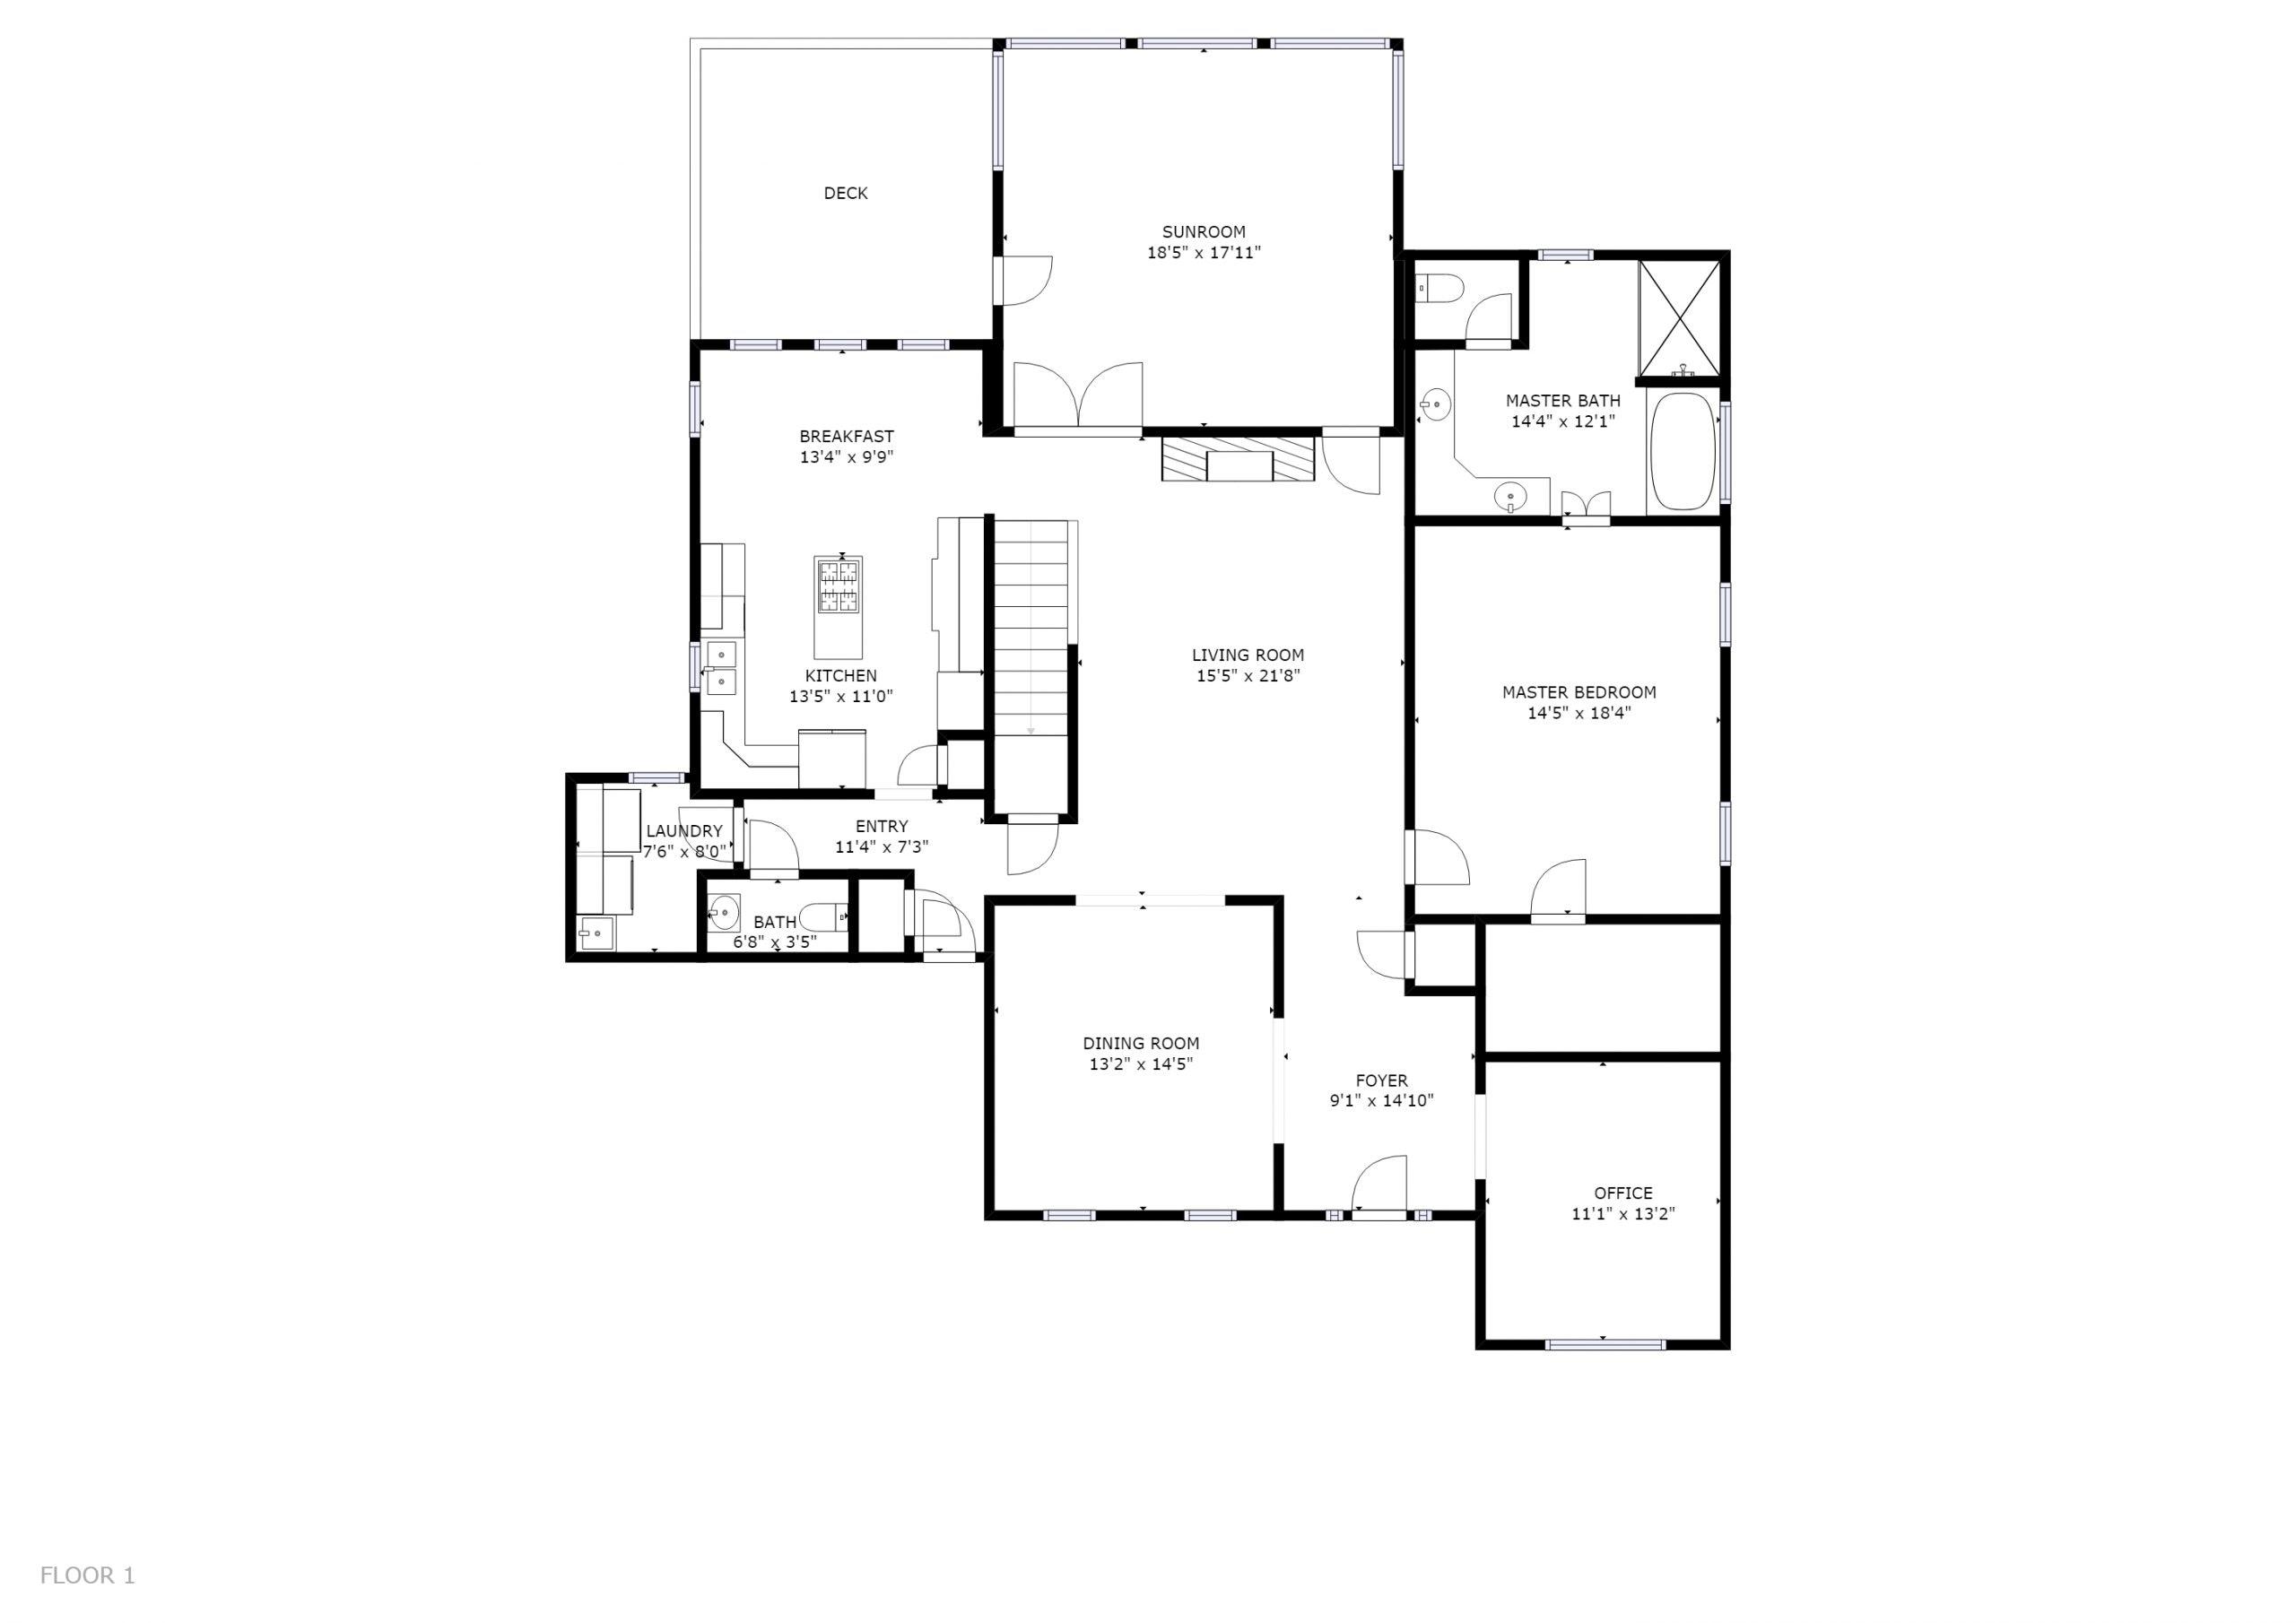 826 BAYSHORE ROAD KNOXVILLE, TN 37934 - Floor Plan 1